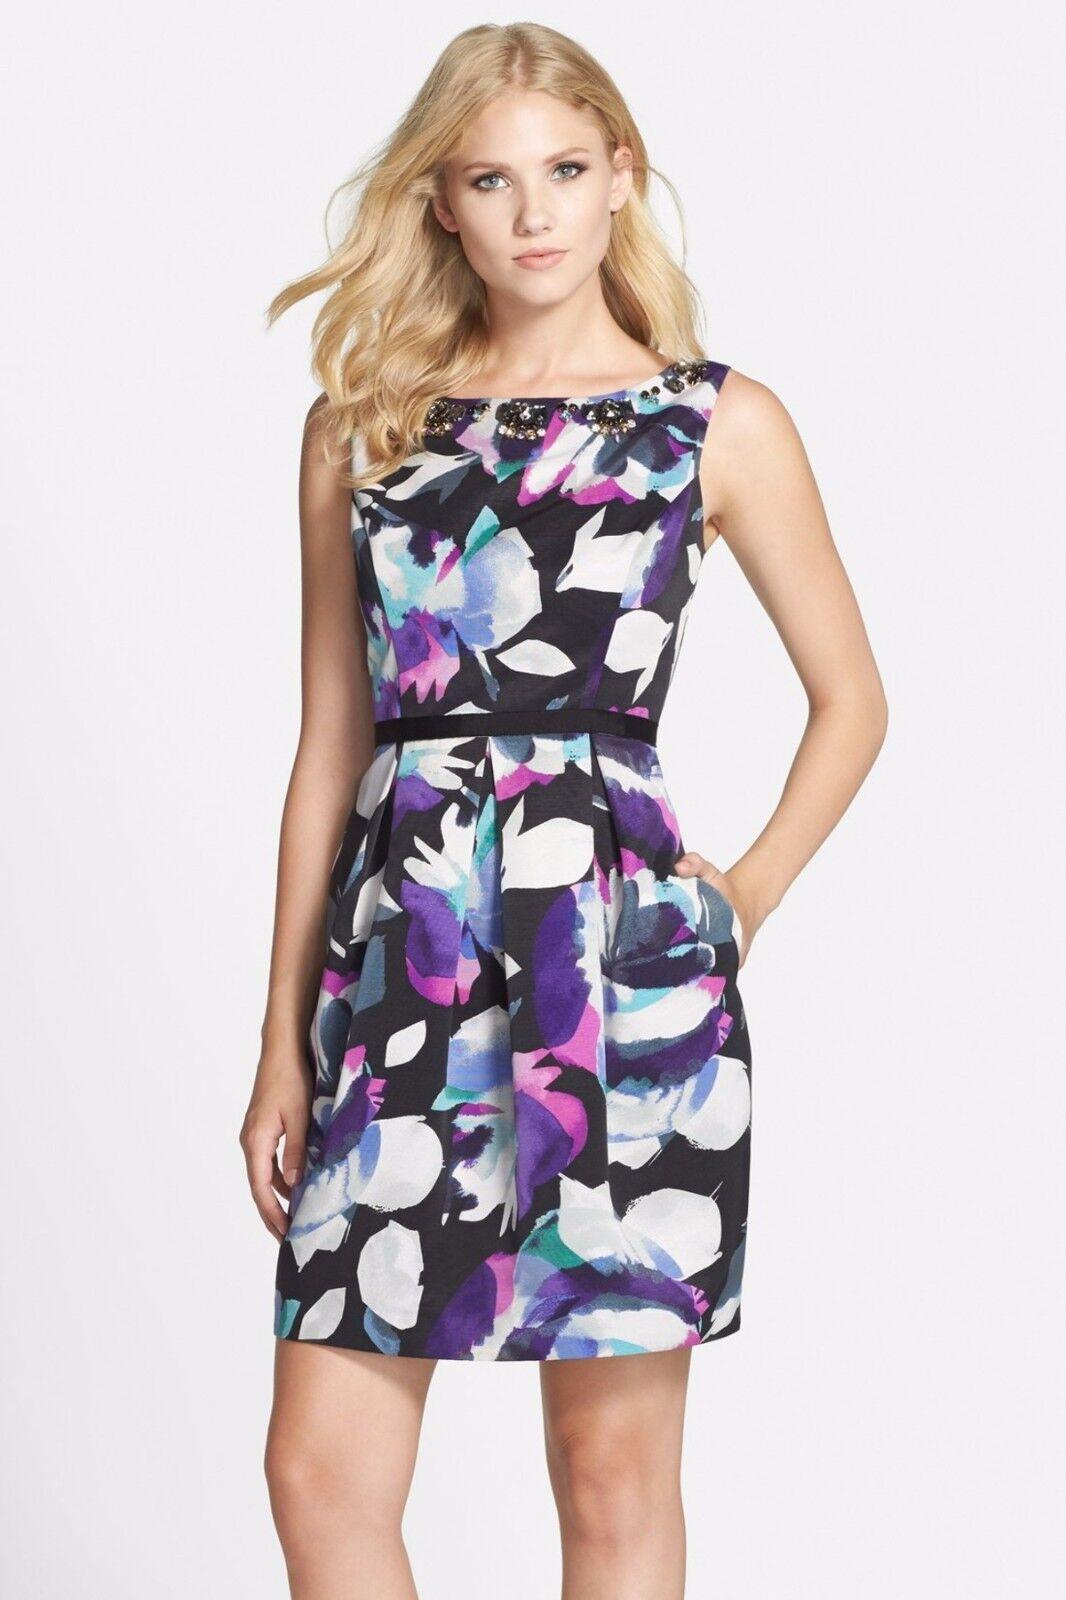 NWT  Eliza J Floral Faille Sheath Dress bluee Purple Floral 8 10 12 14 16 M L